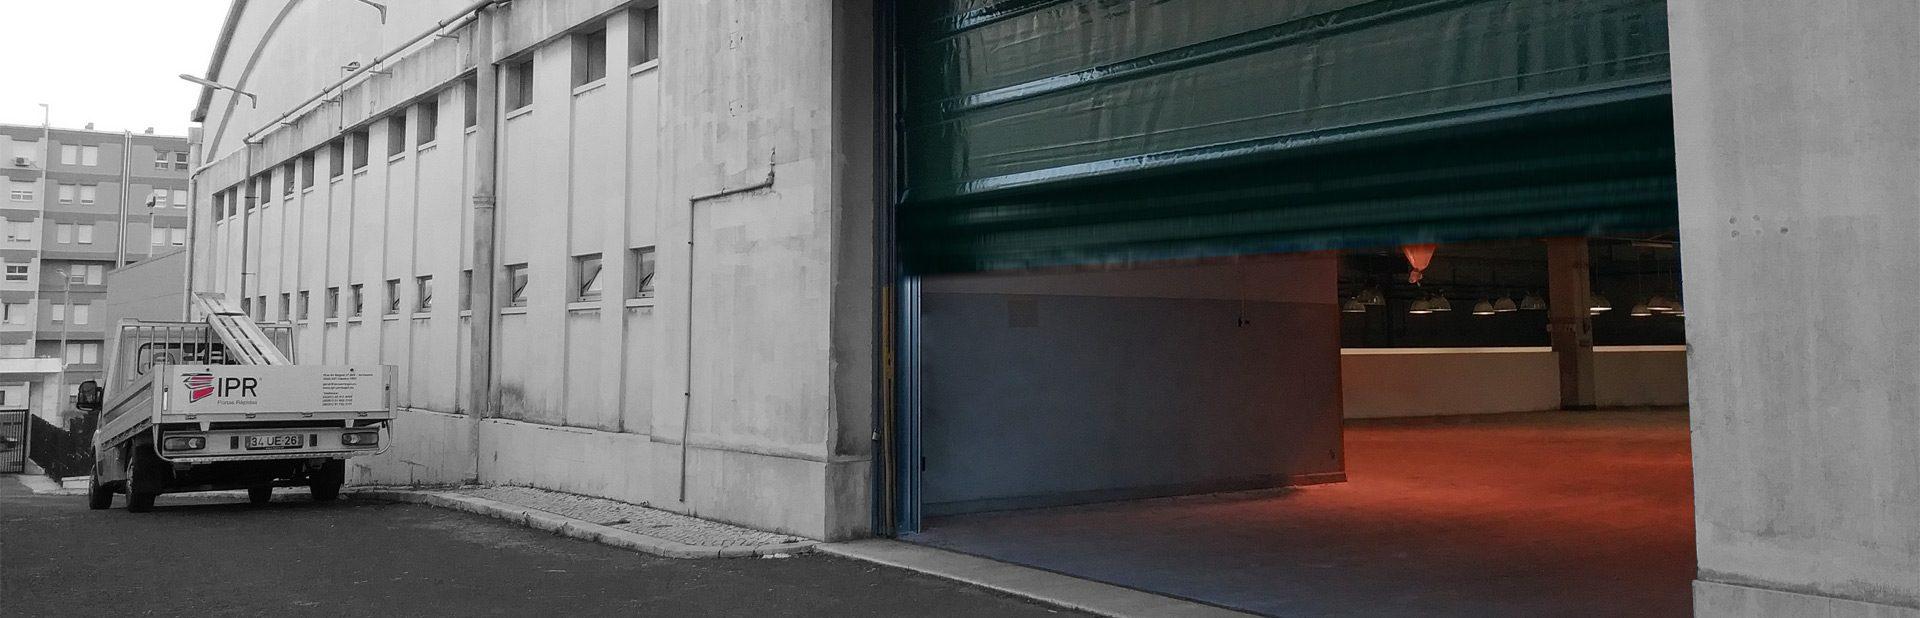 Porta rápida industrial dobrável (fold up) - IPR Belt